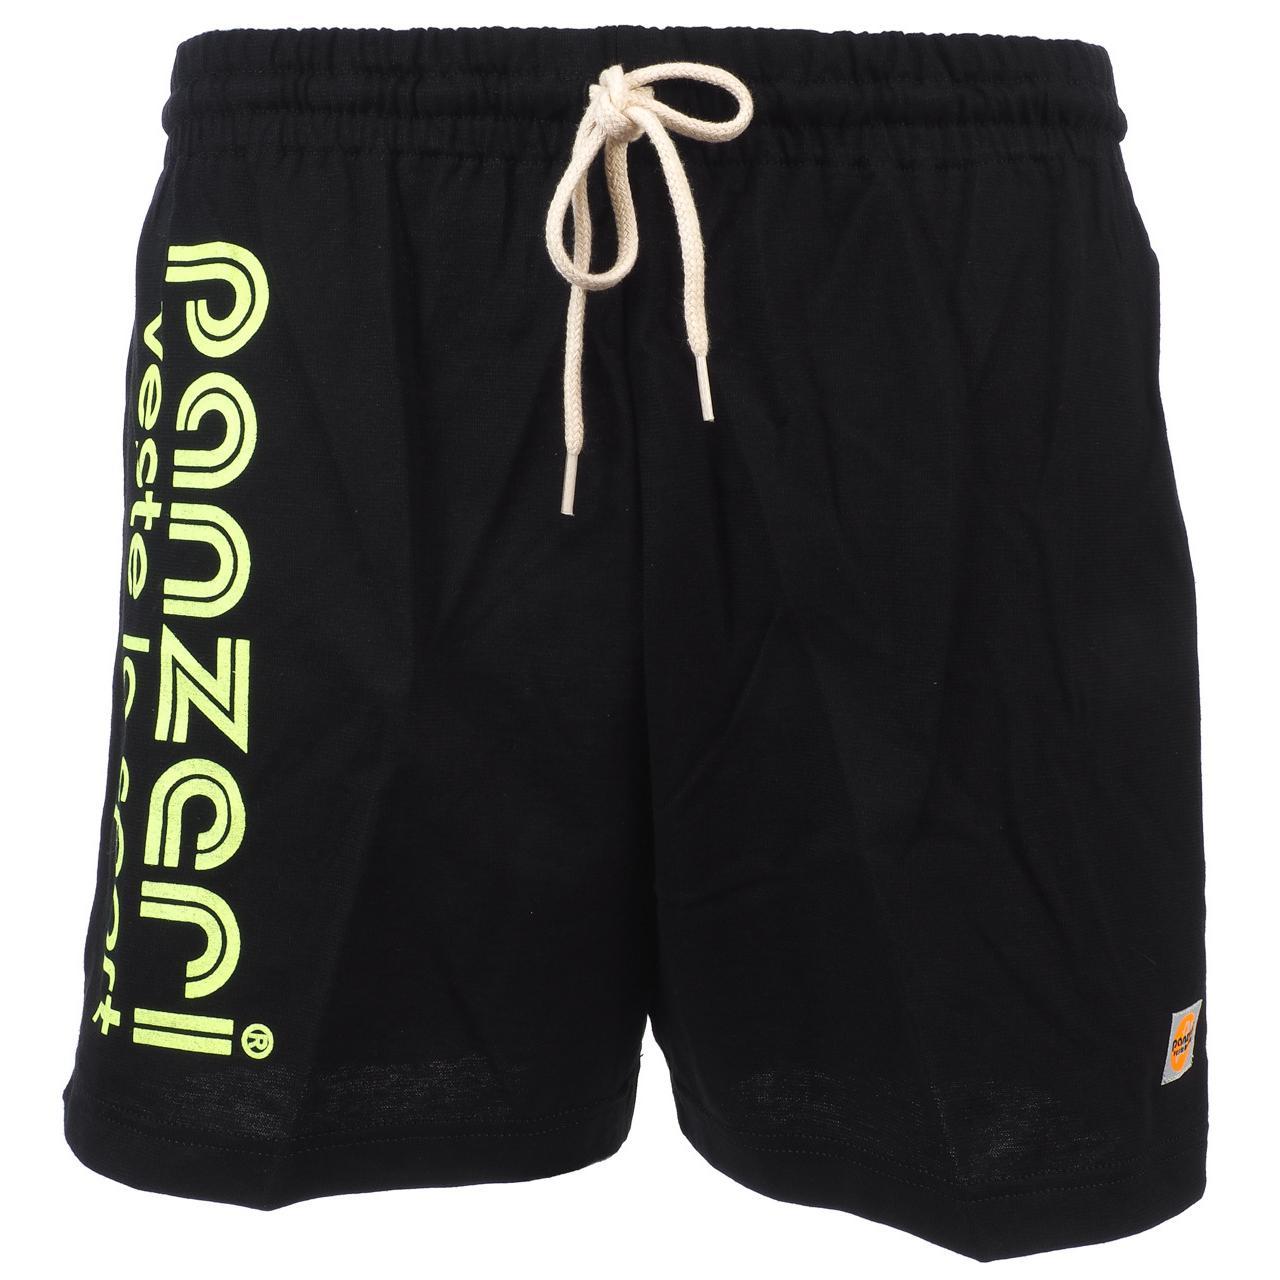 Shorts-Multi-Panzeri-Plain-a-Black-Flowers-Jne-Jersey-Black-22068-New